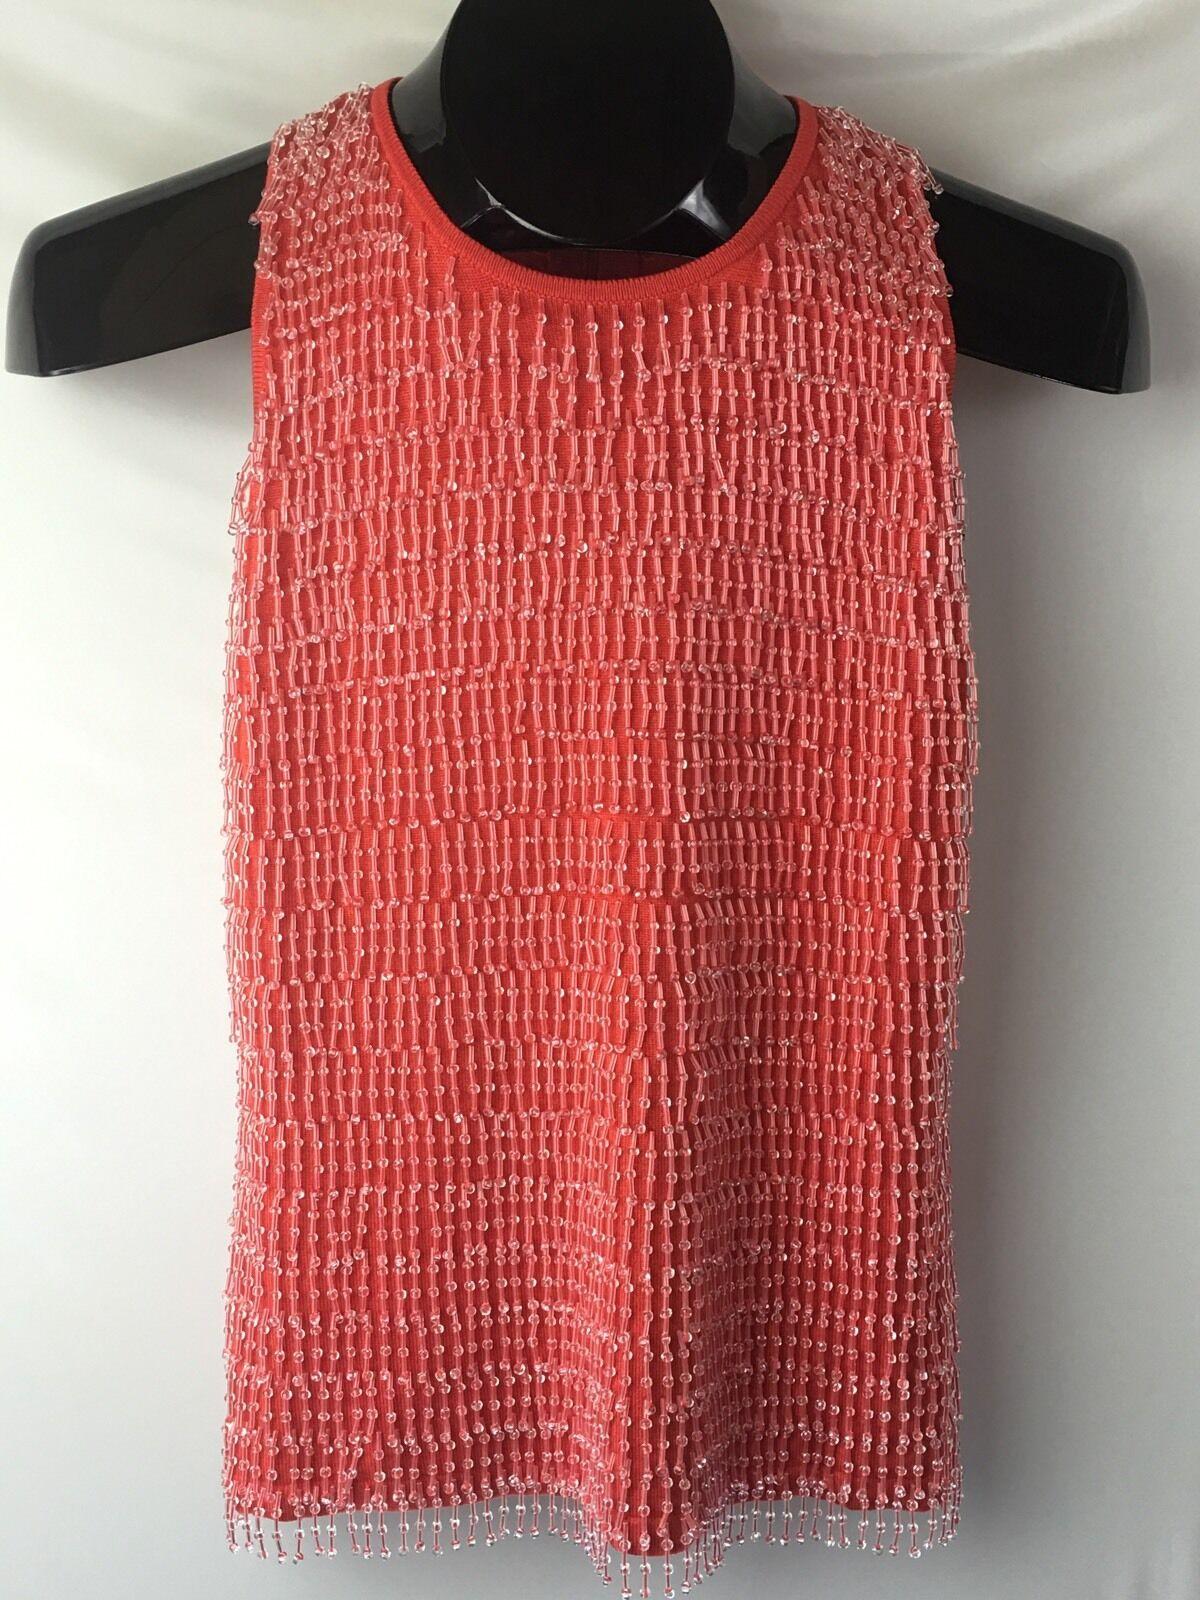 WORTH Womens Salmon Beaded Tank Sleeveless Sweater size P XS Silk Blend